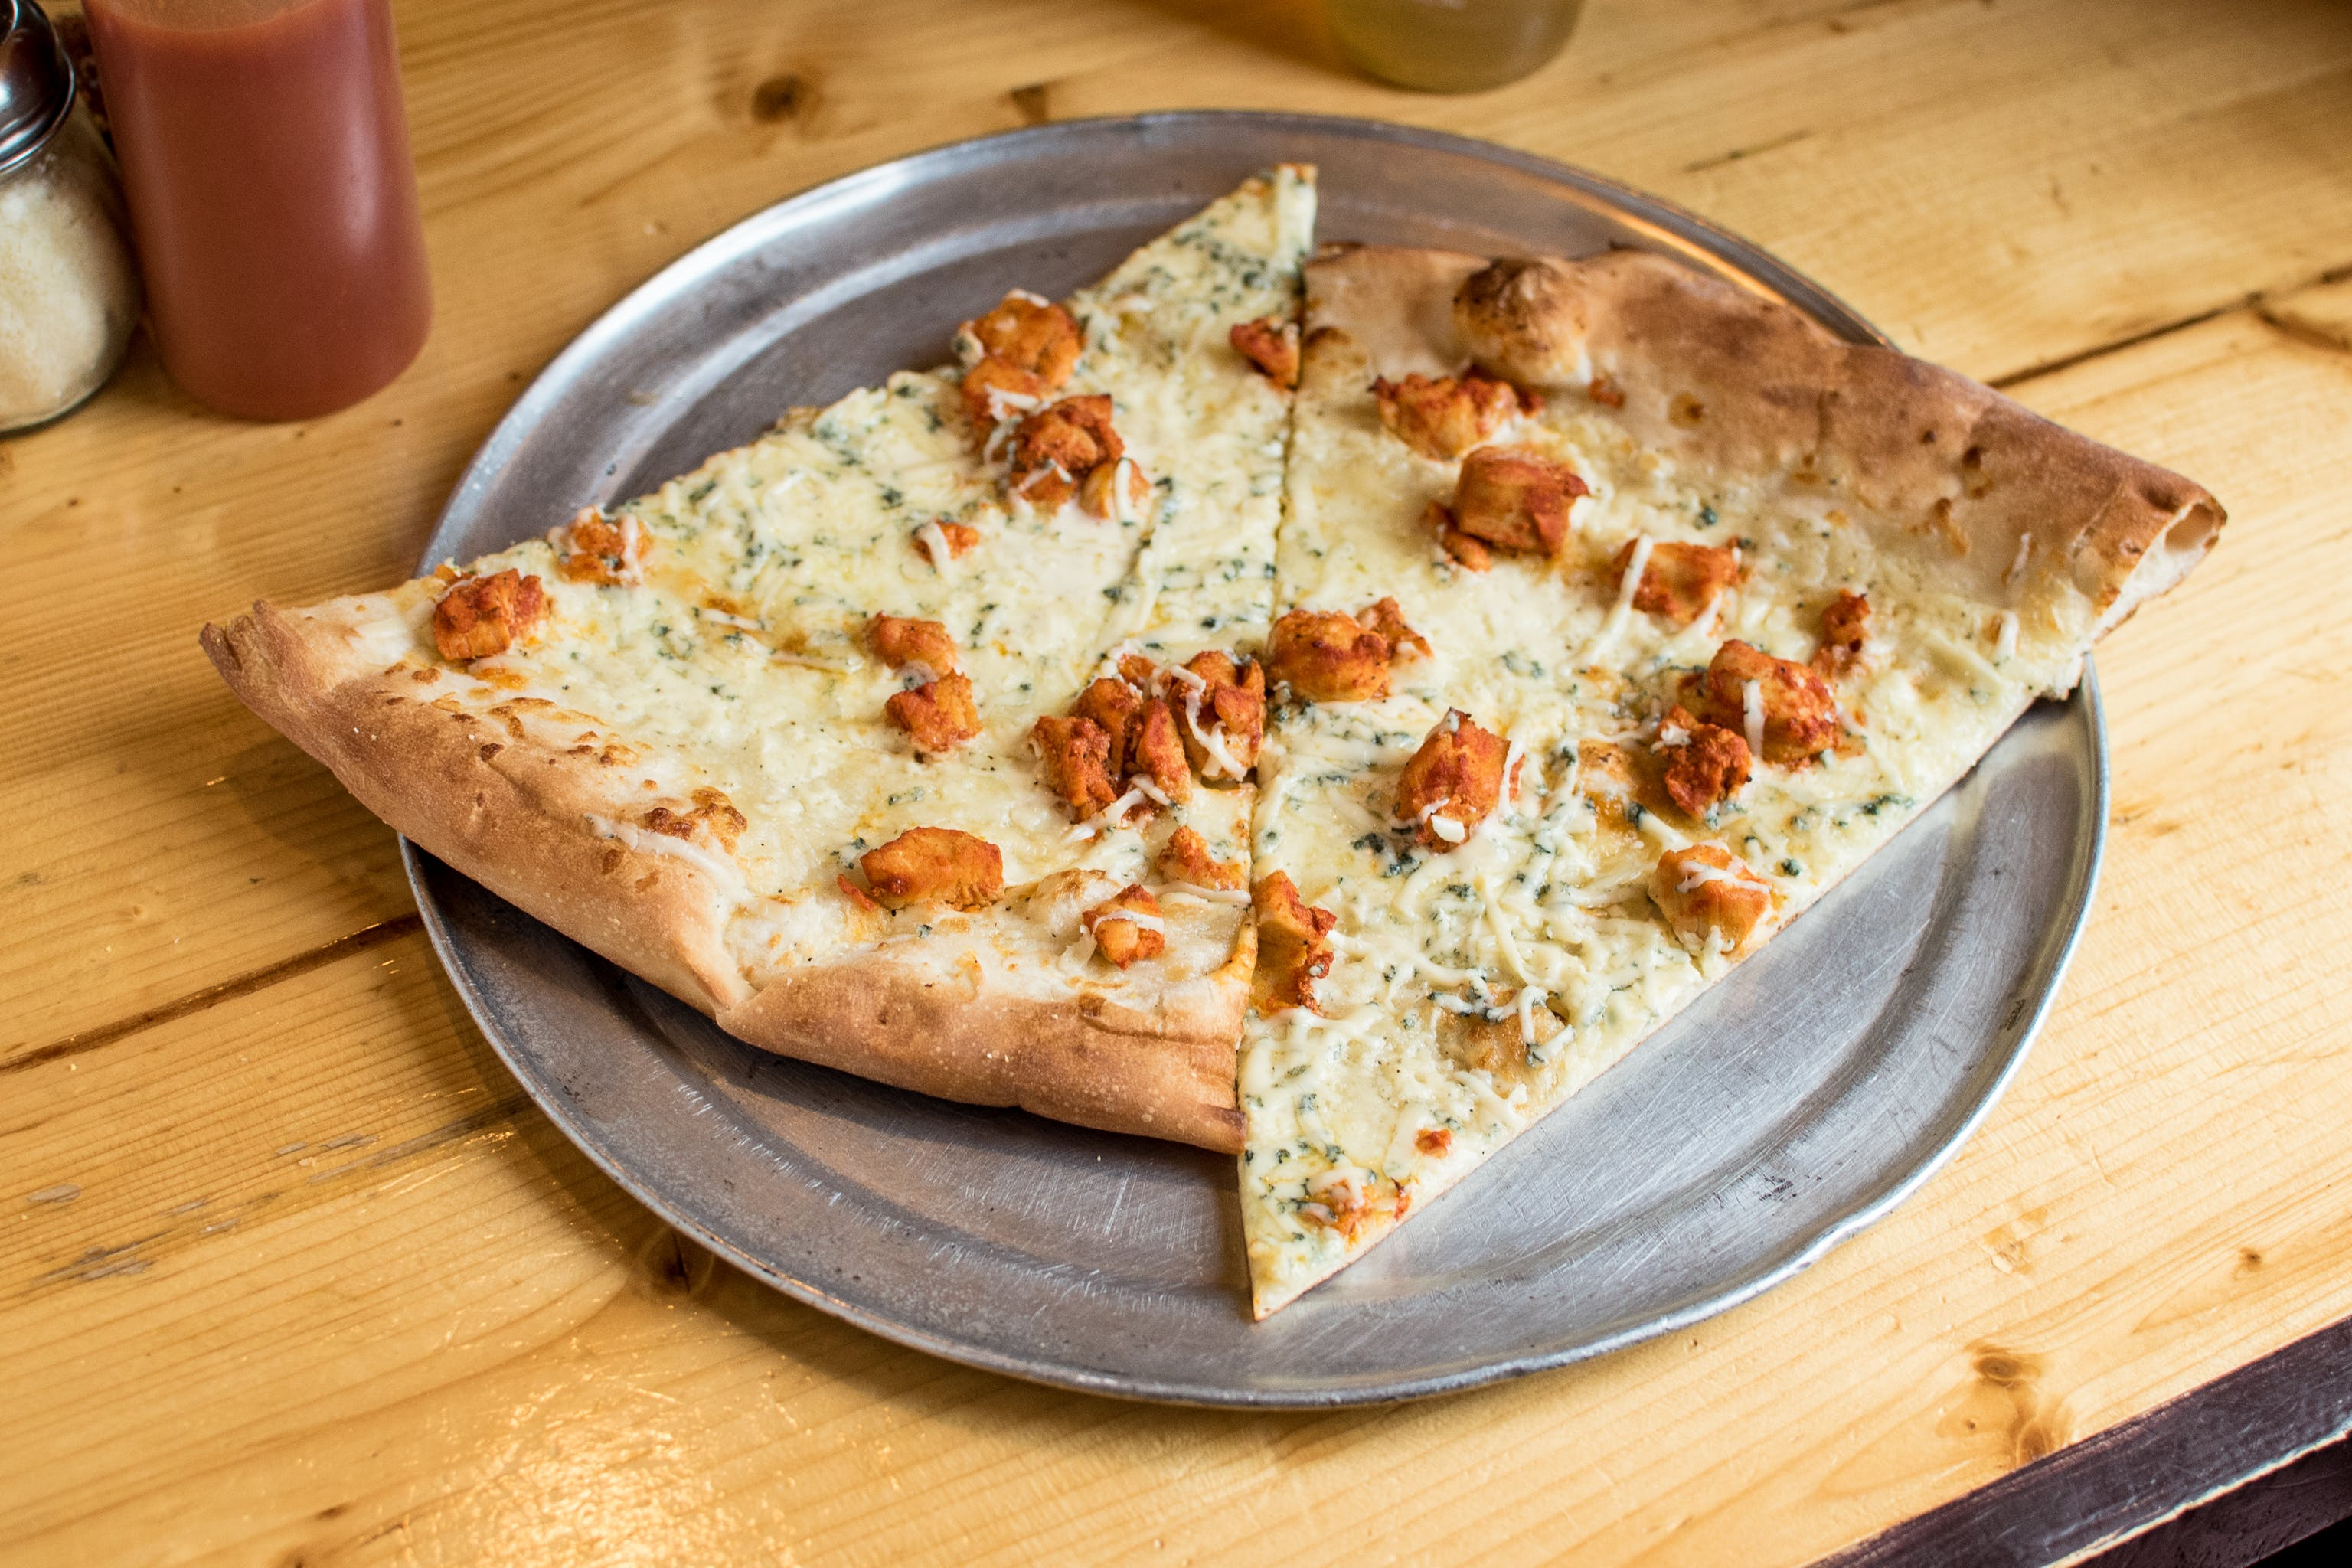 Buffalo Chicken Pizza from Ian's Pizza - Eastside in Milwaukee, WI